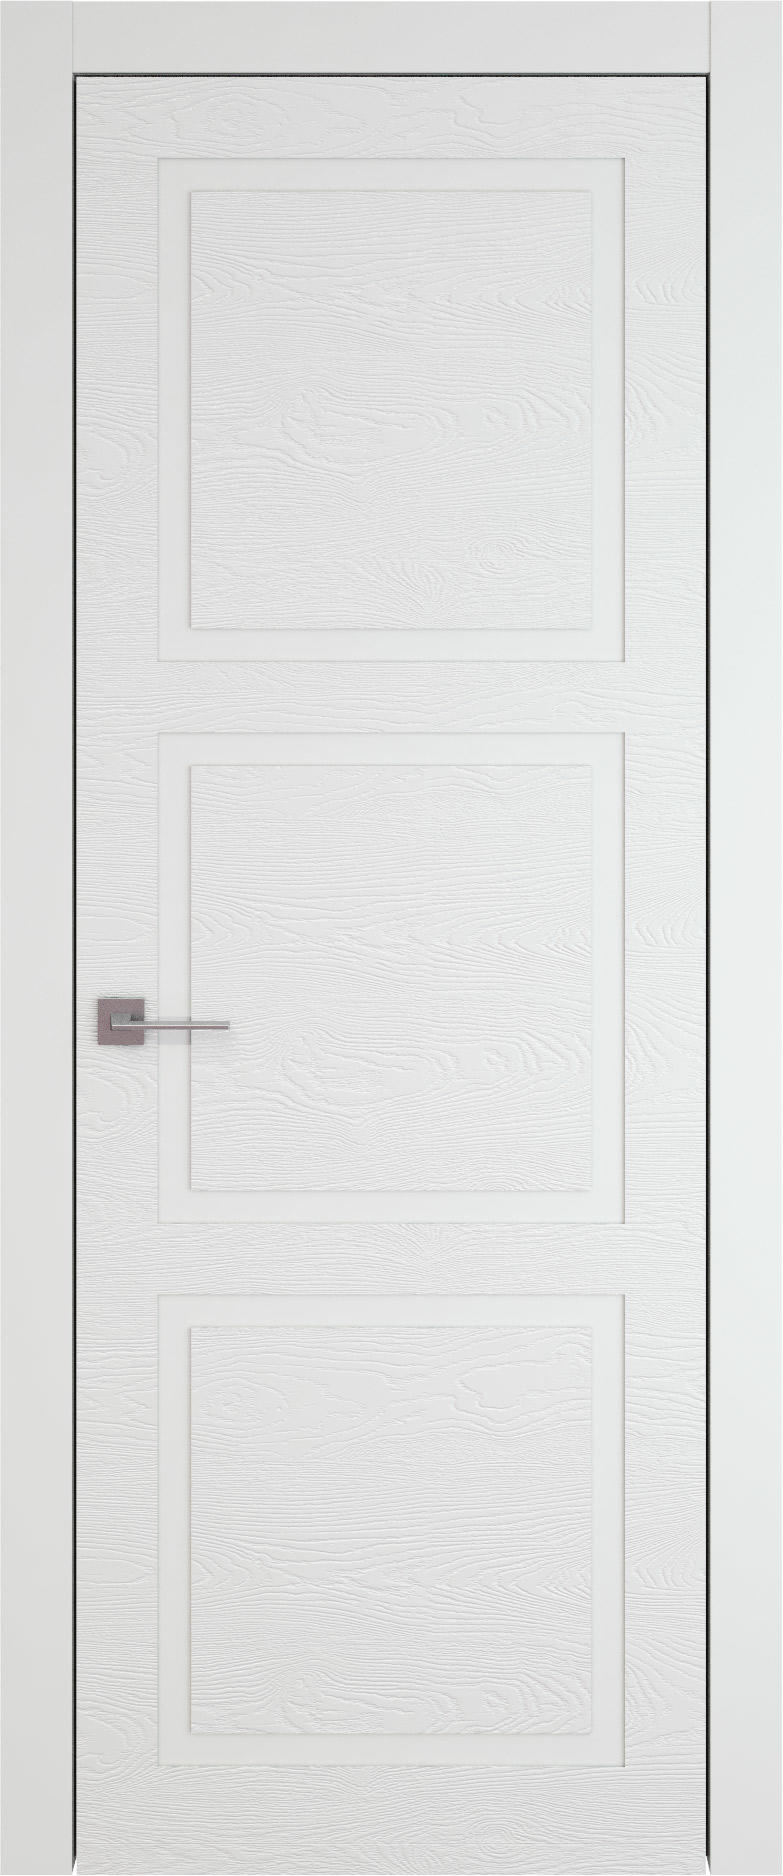 Tivoli Л-5 цвет - Белая эмаль по шпону (RAL 9003) Без стекла (ДГ)